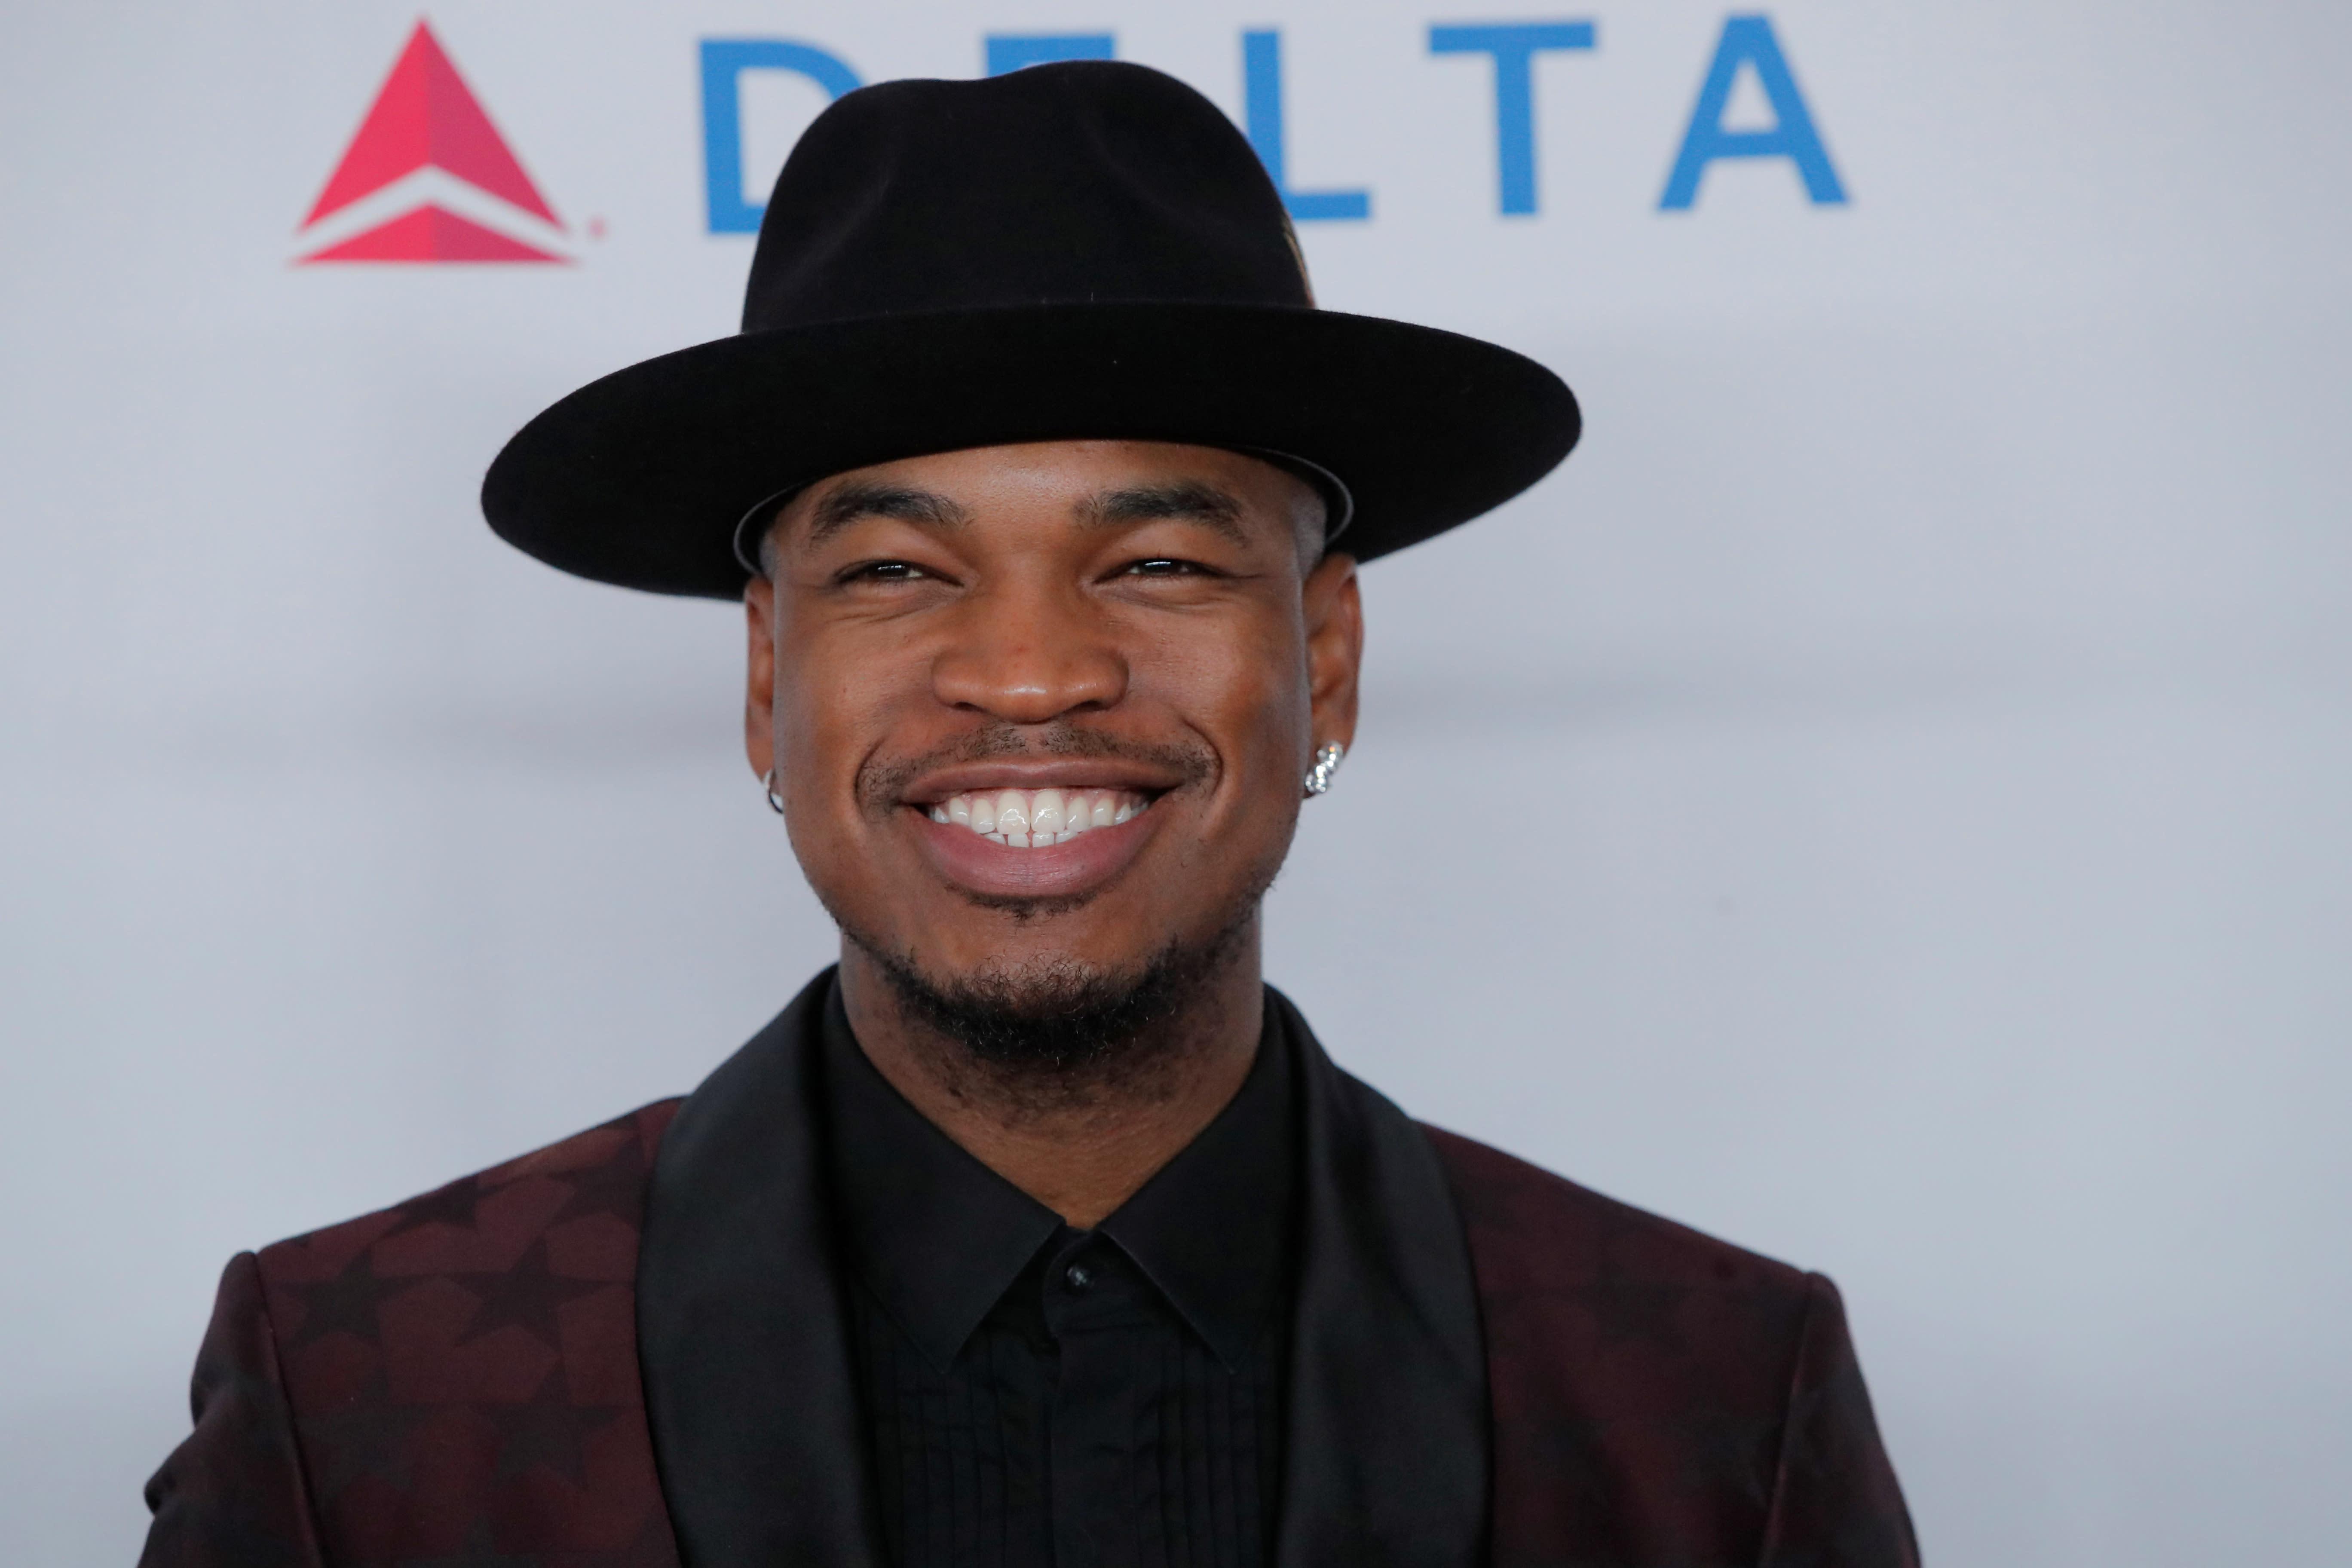 Grammy winner Ne-Yo backs a tuition-free school that makes tech accessible to everyone